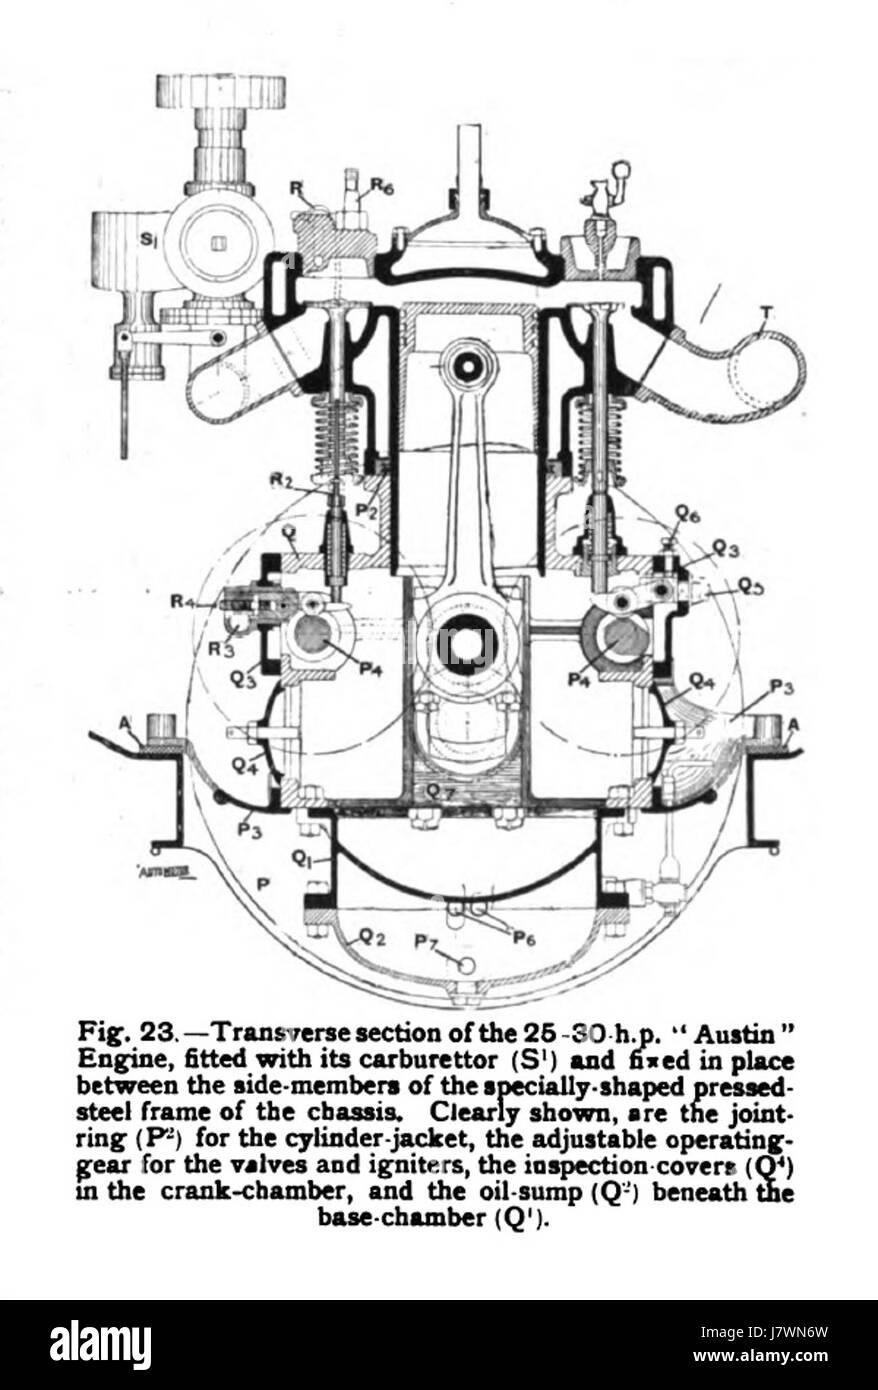 Austin 25 30 engine transverse section - Stock Image